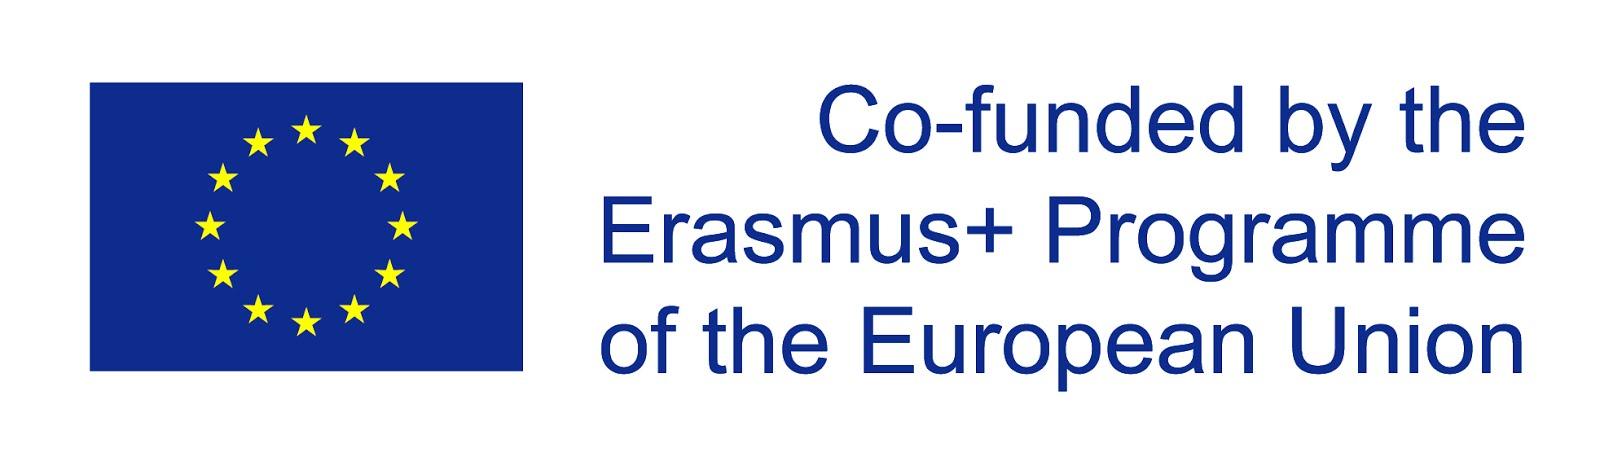 Erasmus Bridge Project